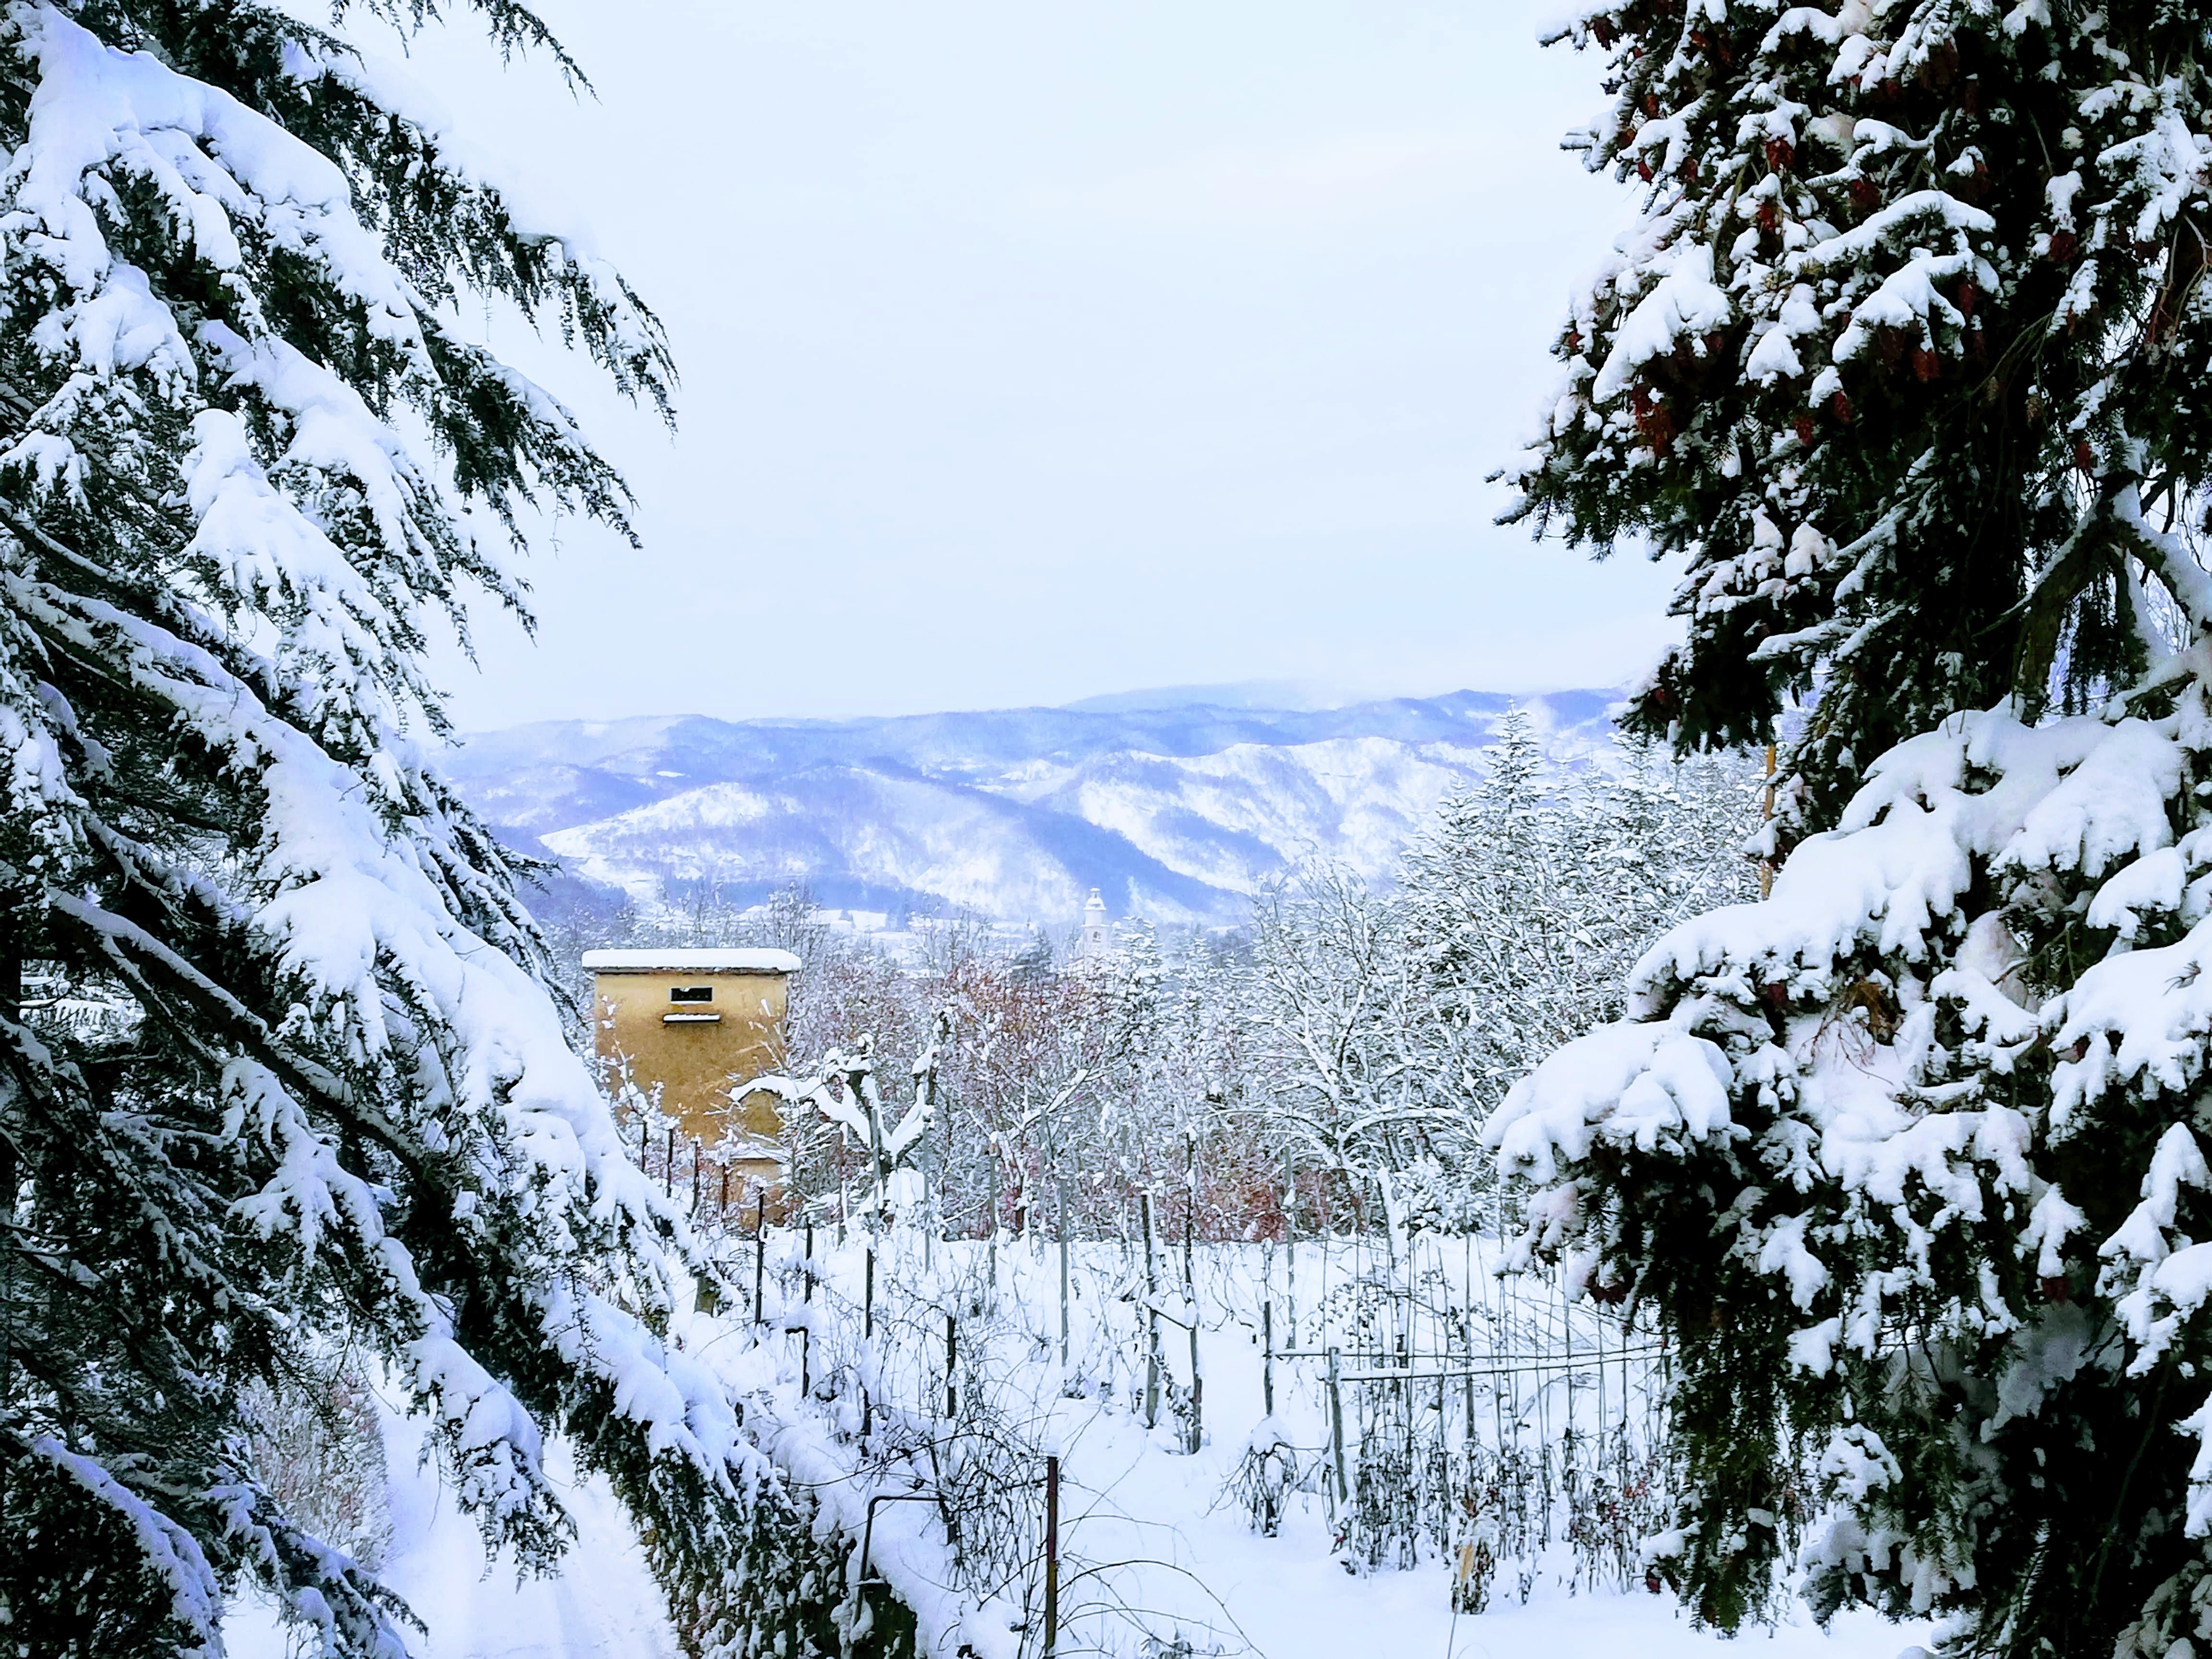 Neve a Spigno Controvento